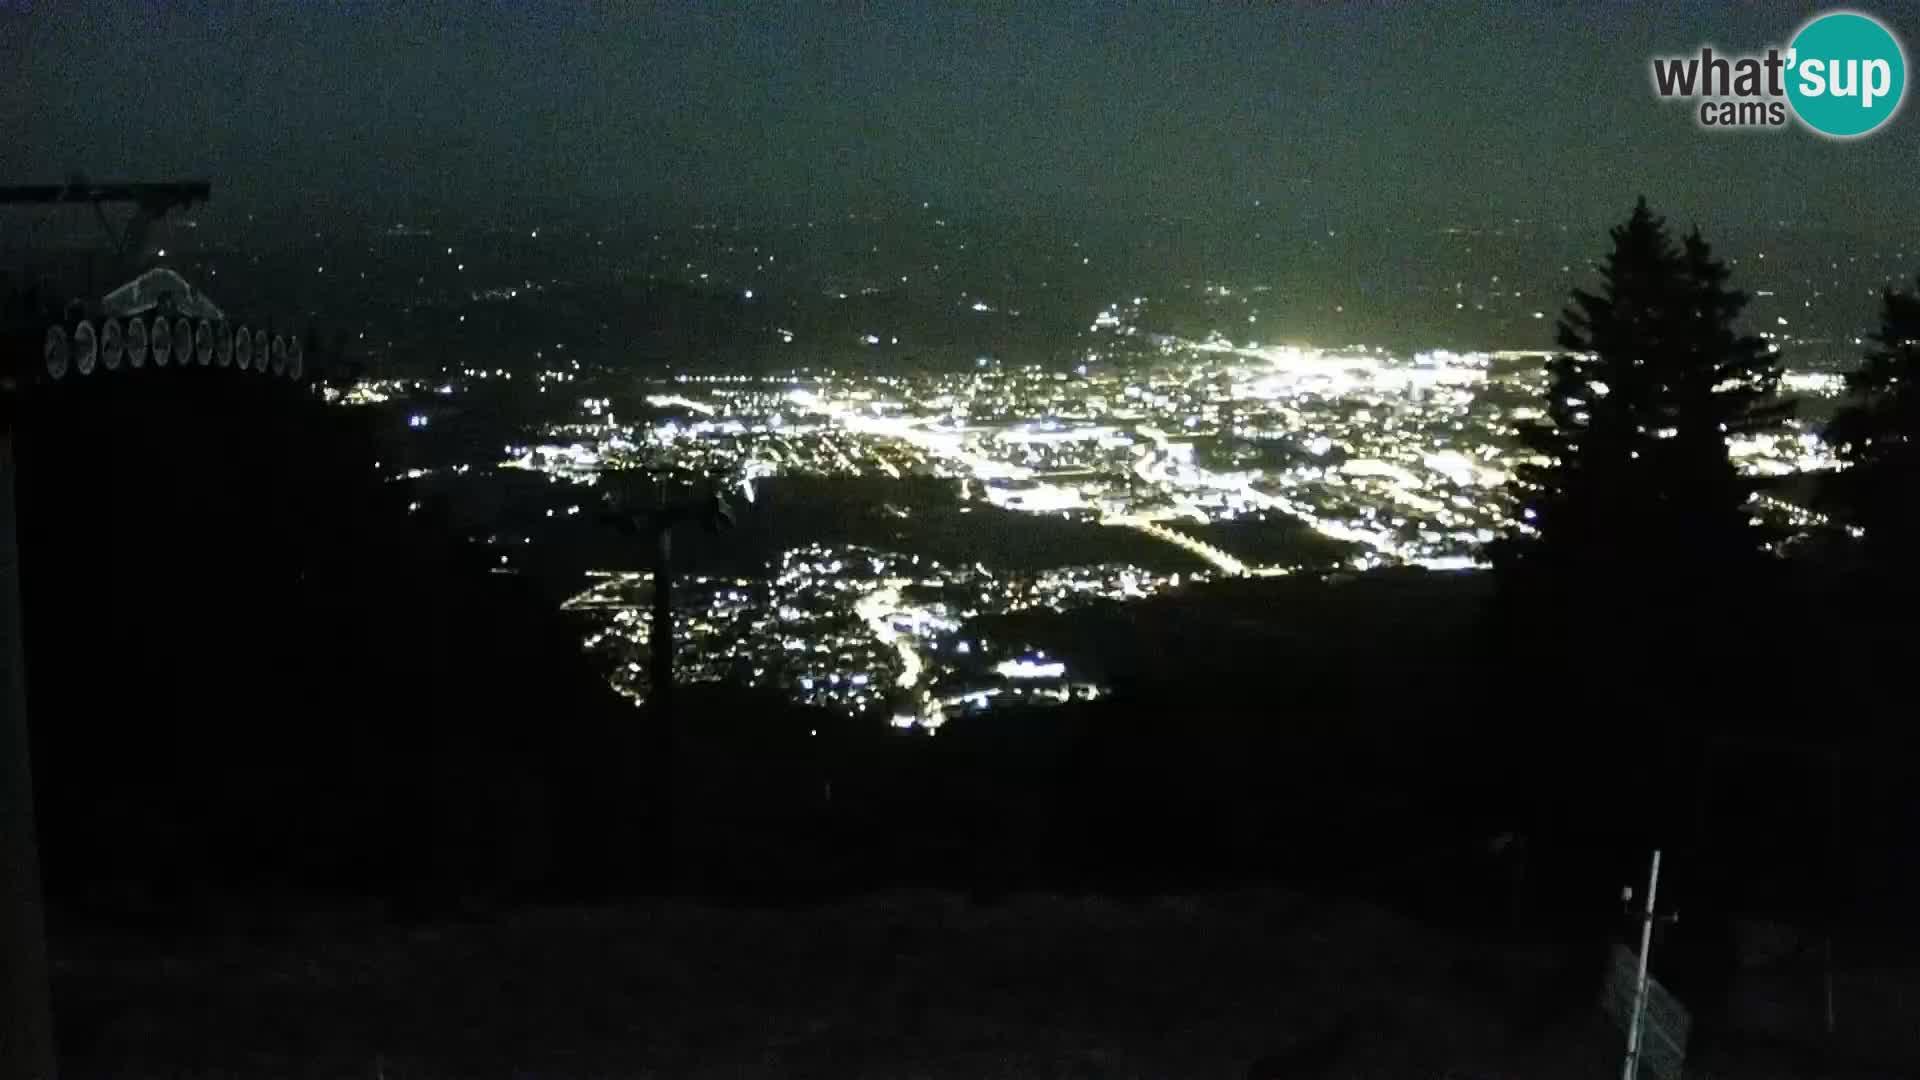 Stazione sciistica Maribor Pohorje – Bellevue